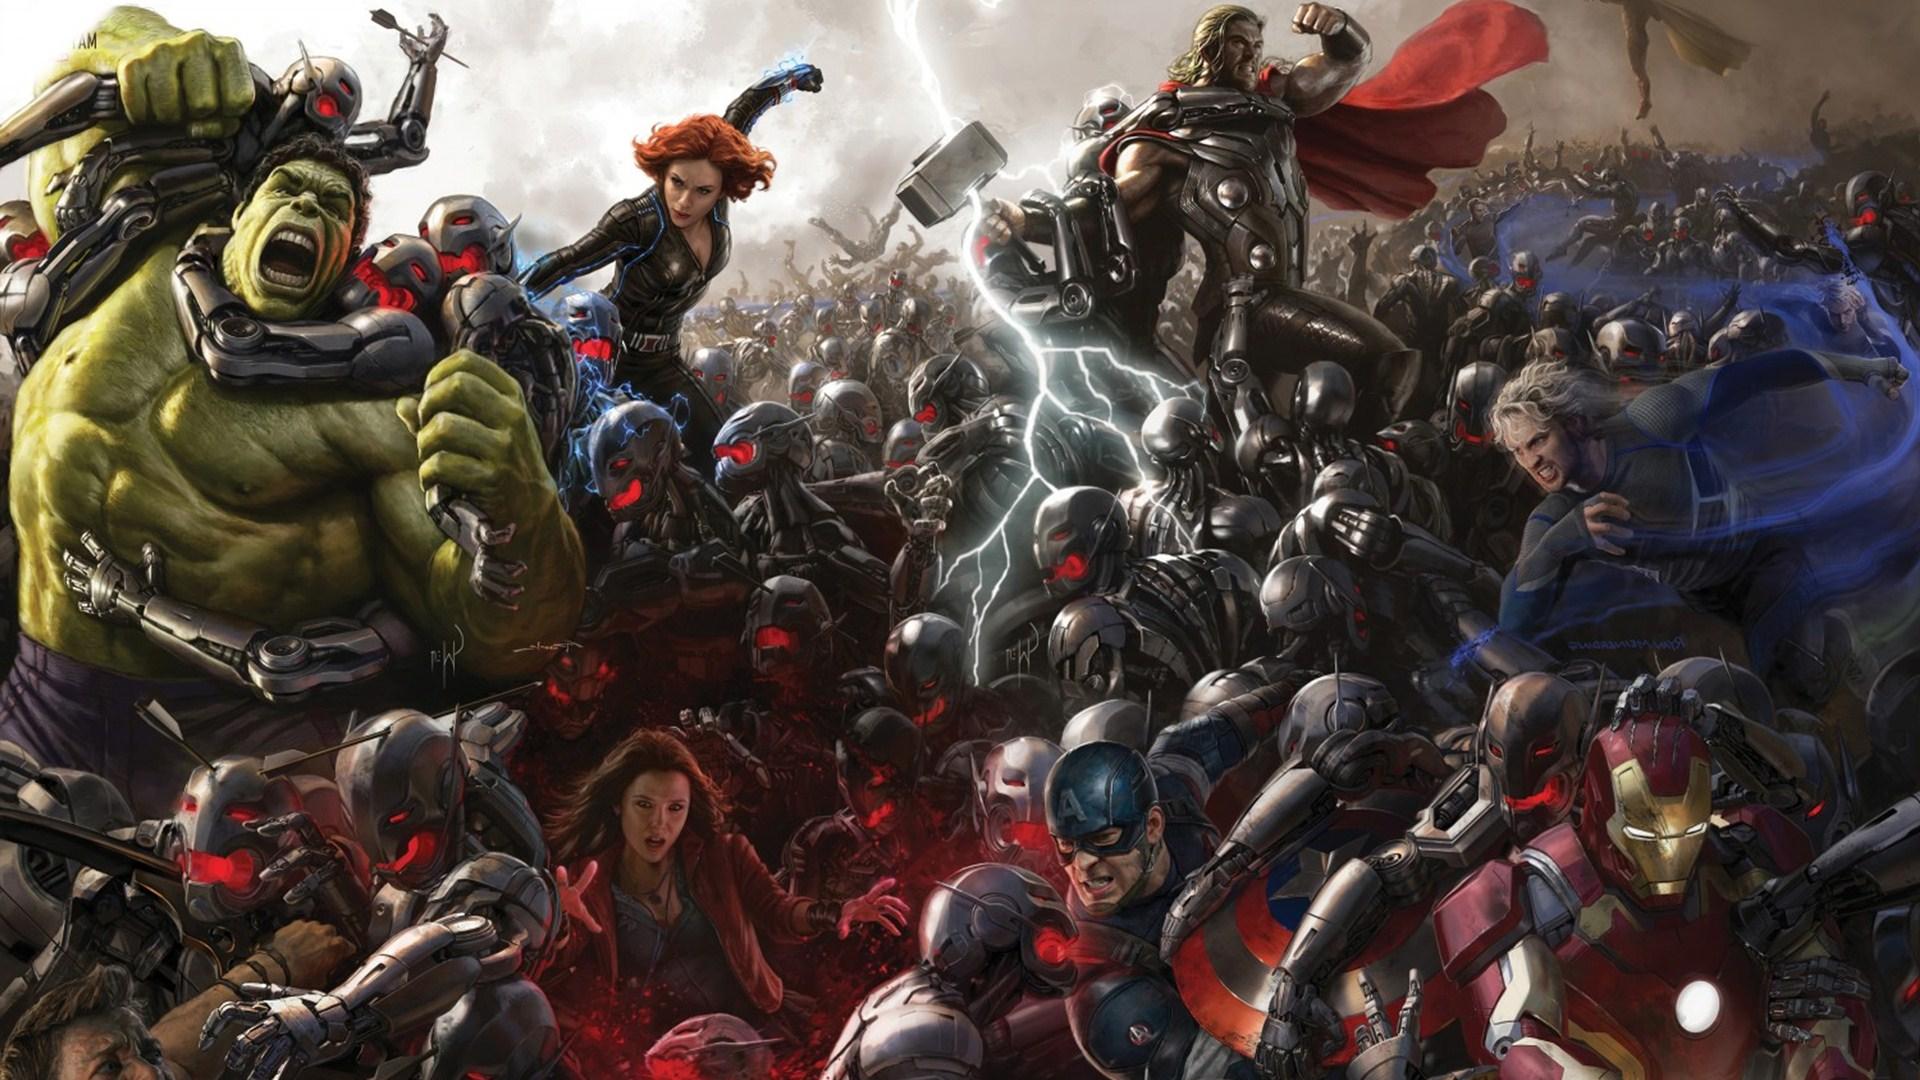 Avengers Age of Ultron 2015 HD Wallpapers by hdwallpapersnewscom 1920x1080